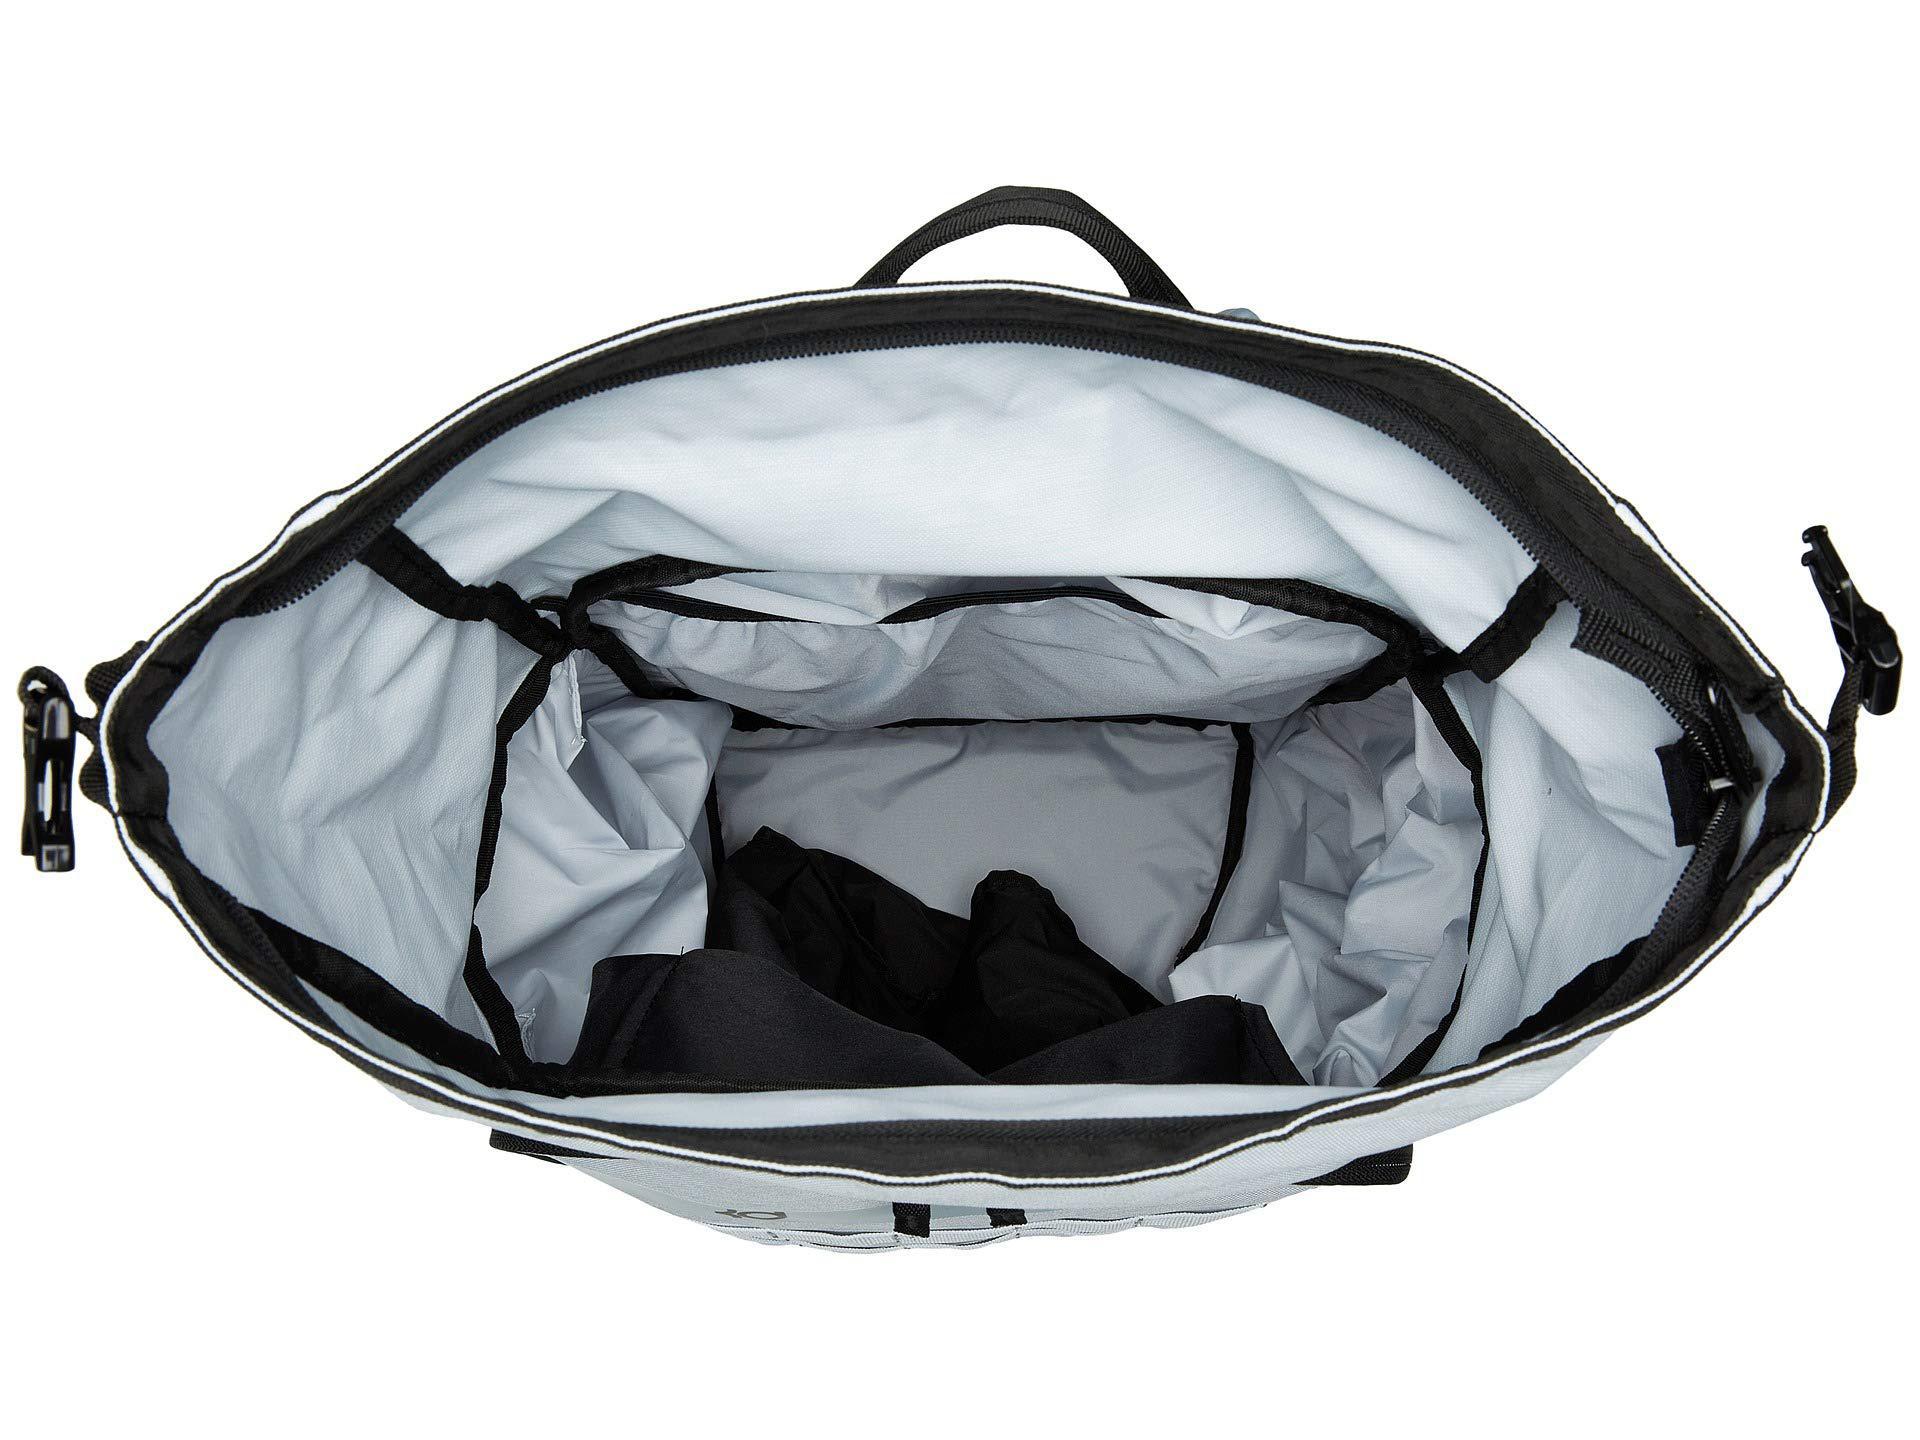 Lyst - Nike Kd Trey 5 Backpack (pure Platinum black university Red ... c577b2a40146f